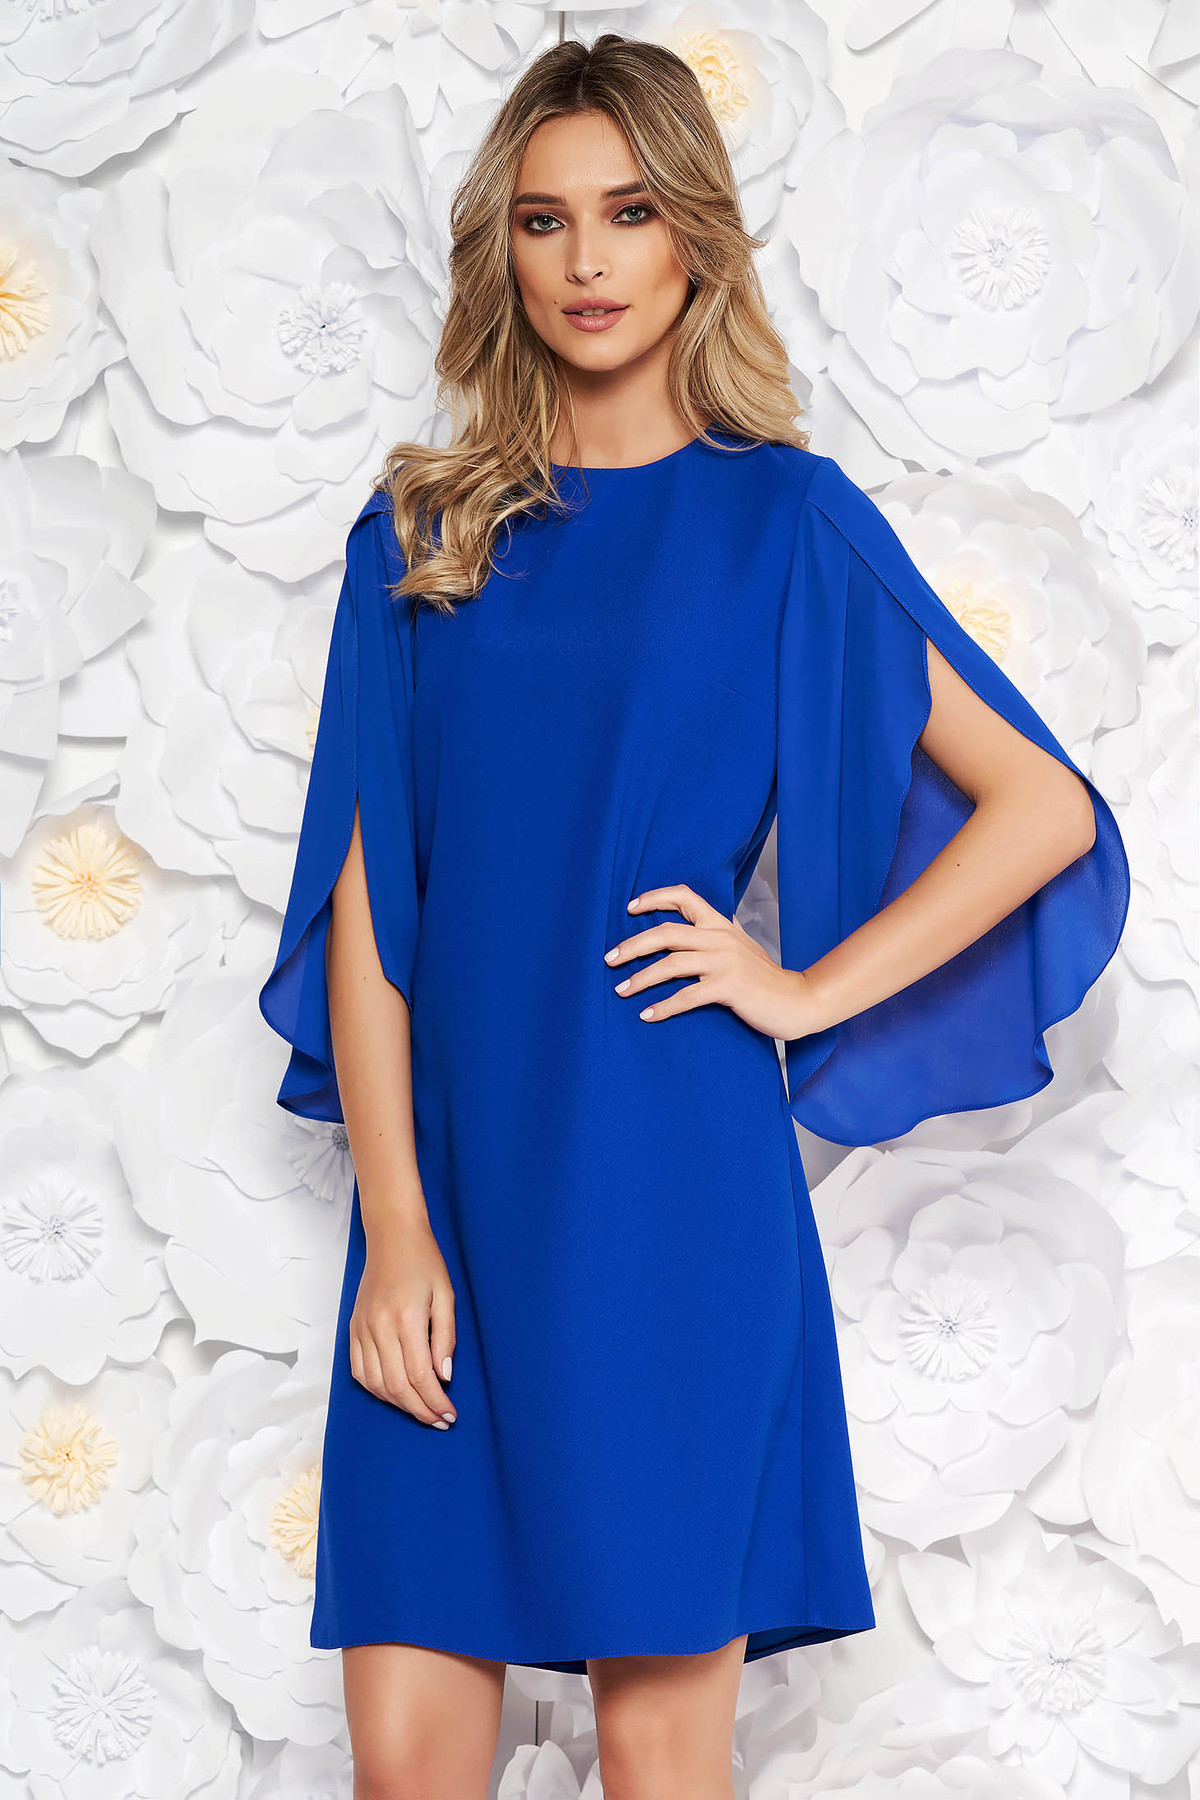 Rochie albastra eleganta cu croi larg cu maneca 3/4 transparente